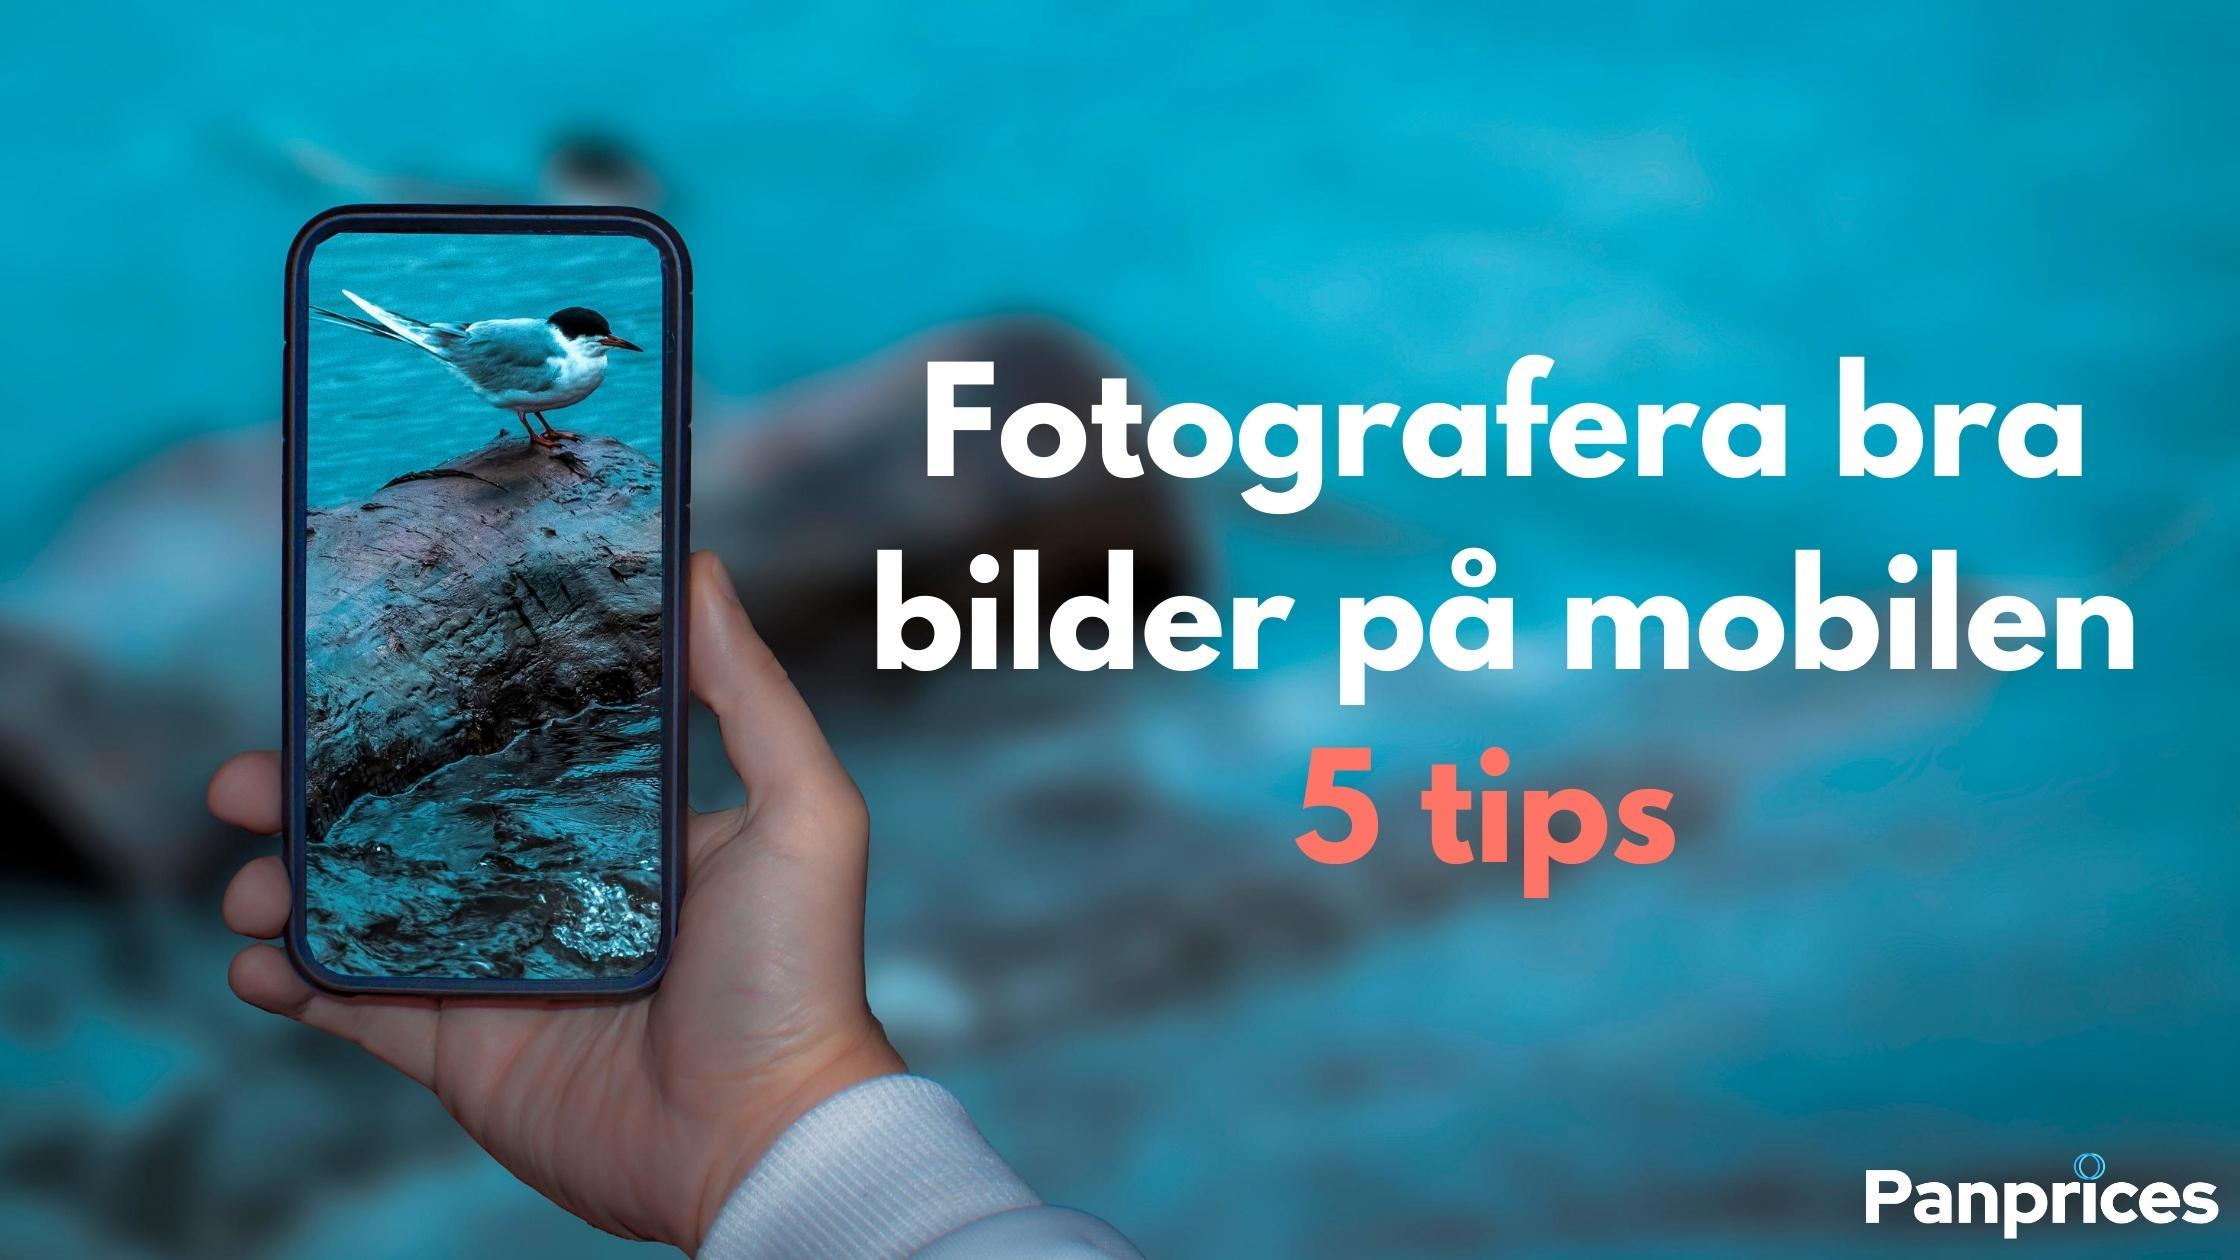 5 tips på hur du kan ta riktigt bra bilder med mobilen